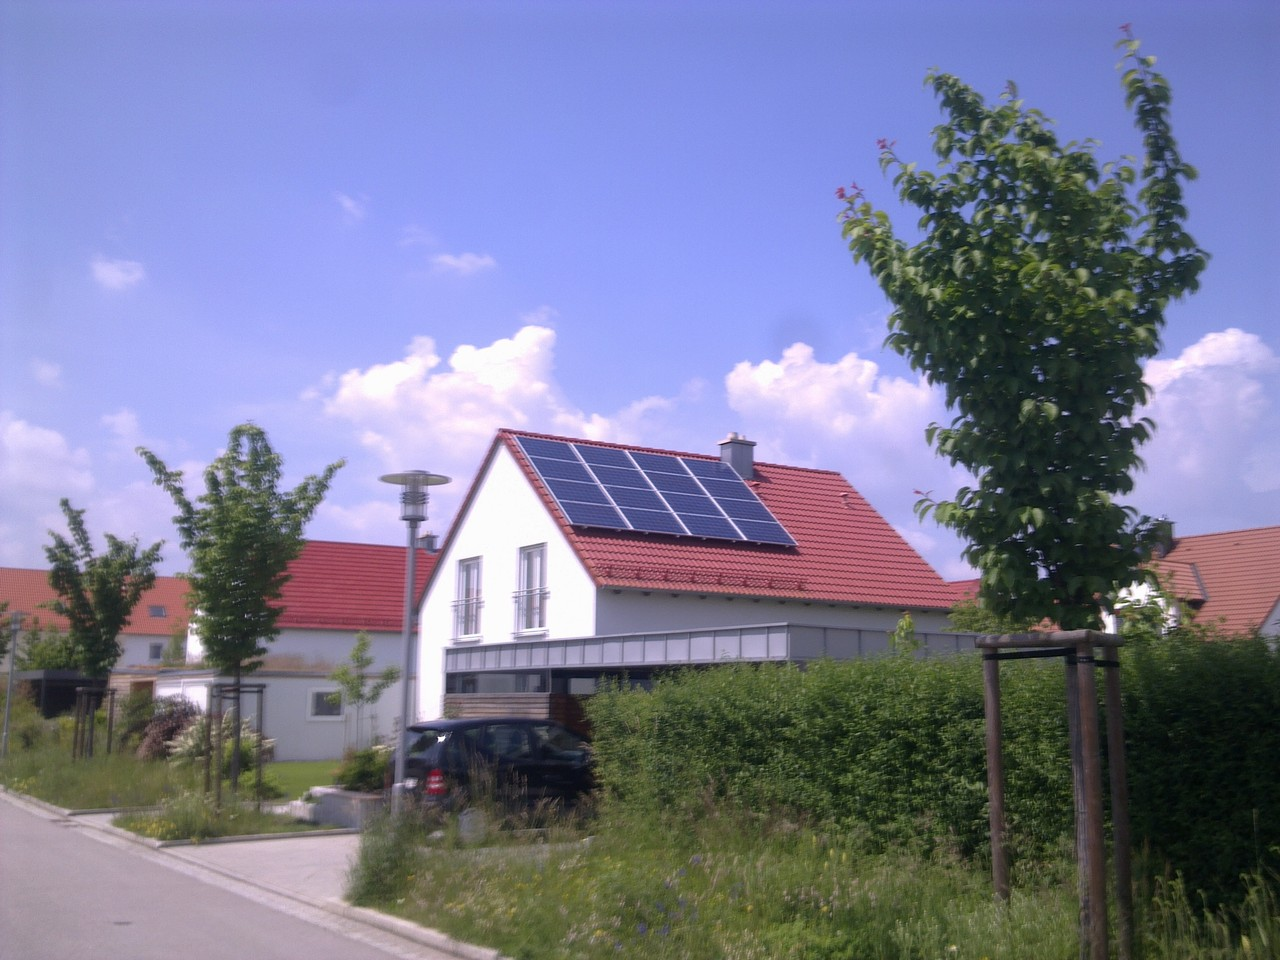 7,5 kWp Photovoltaikanlage in 93055 Burgweinting